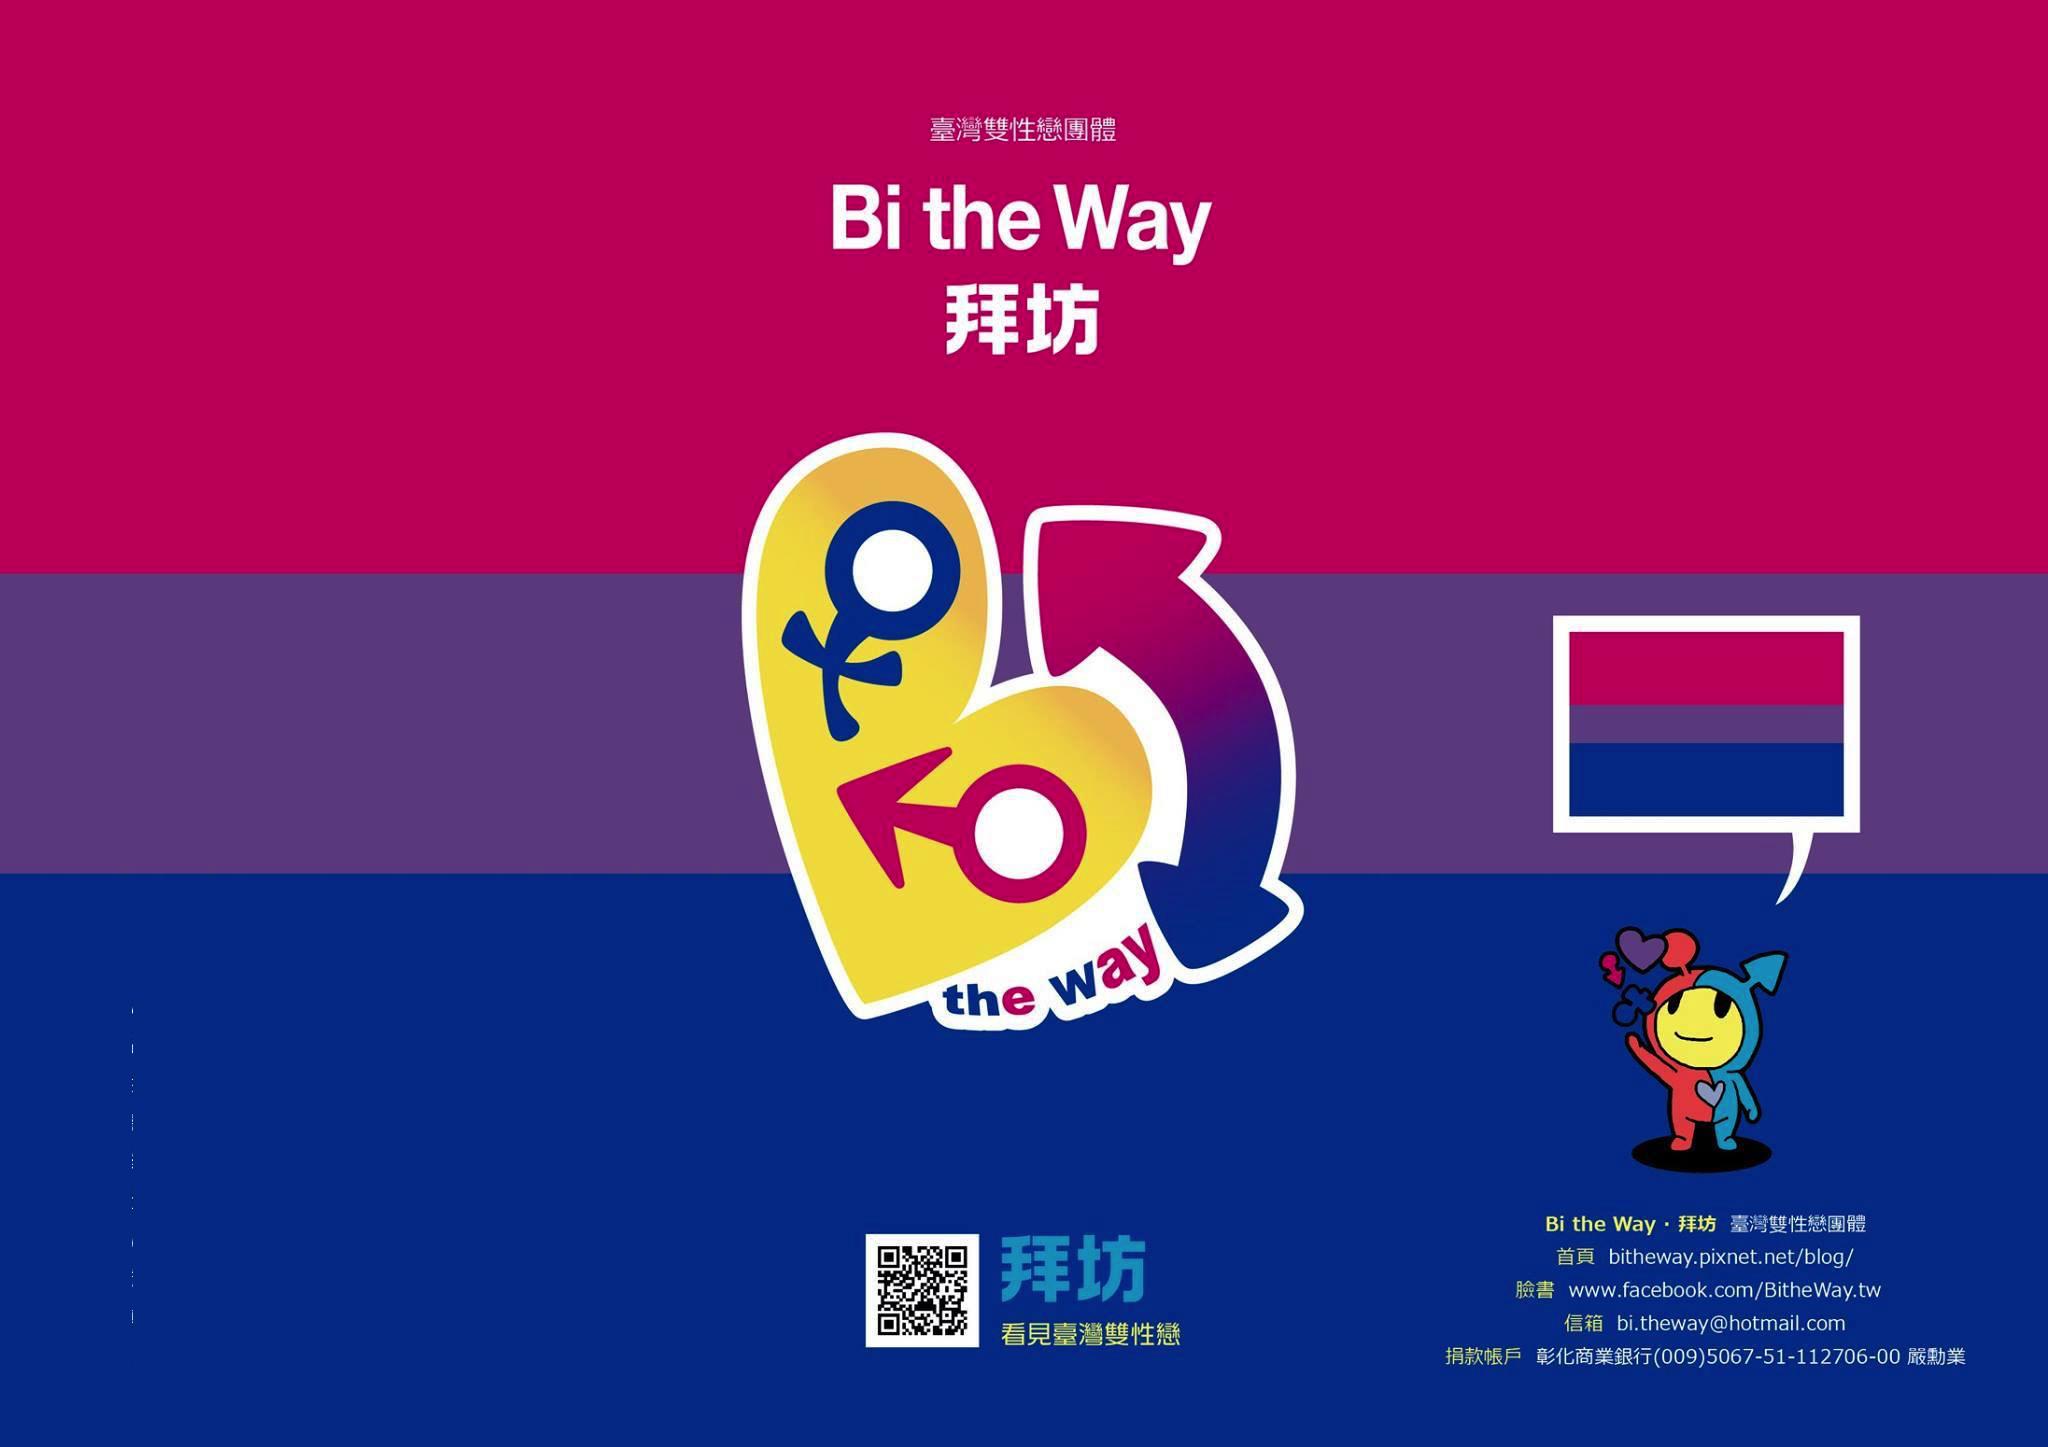 Bi the Way 首圖